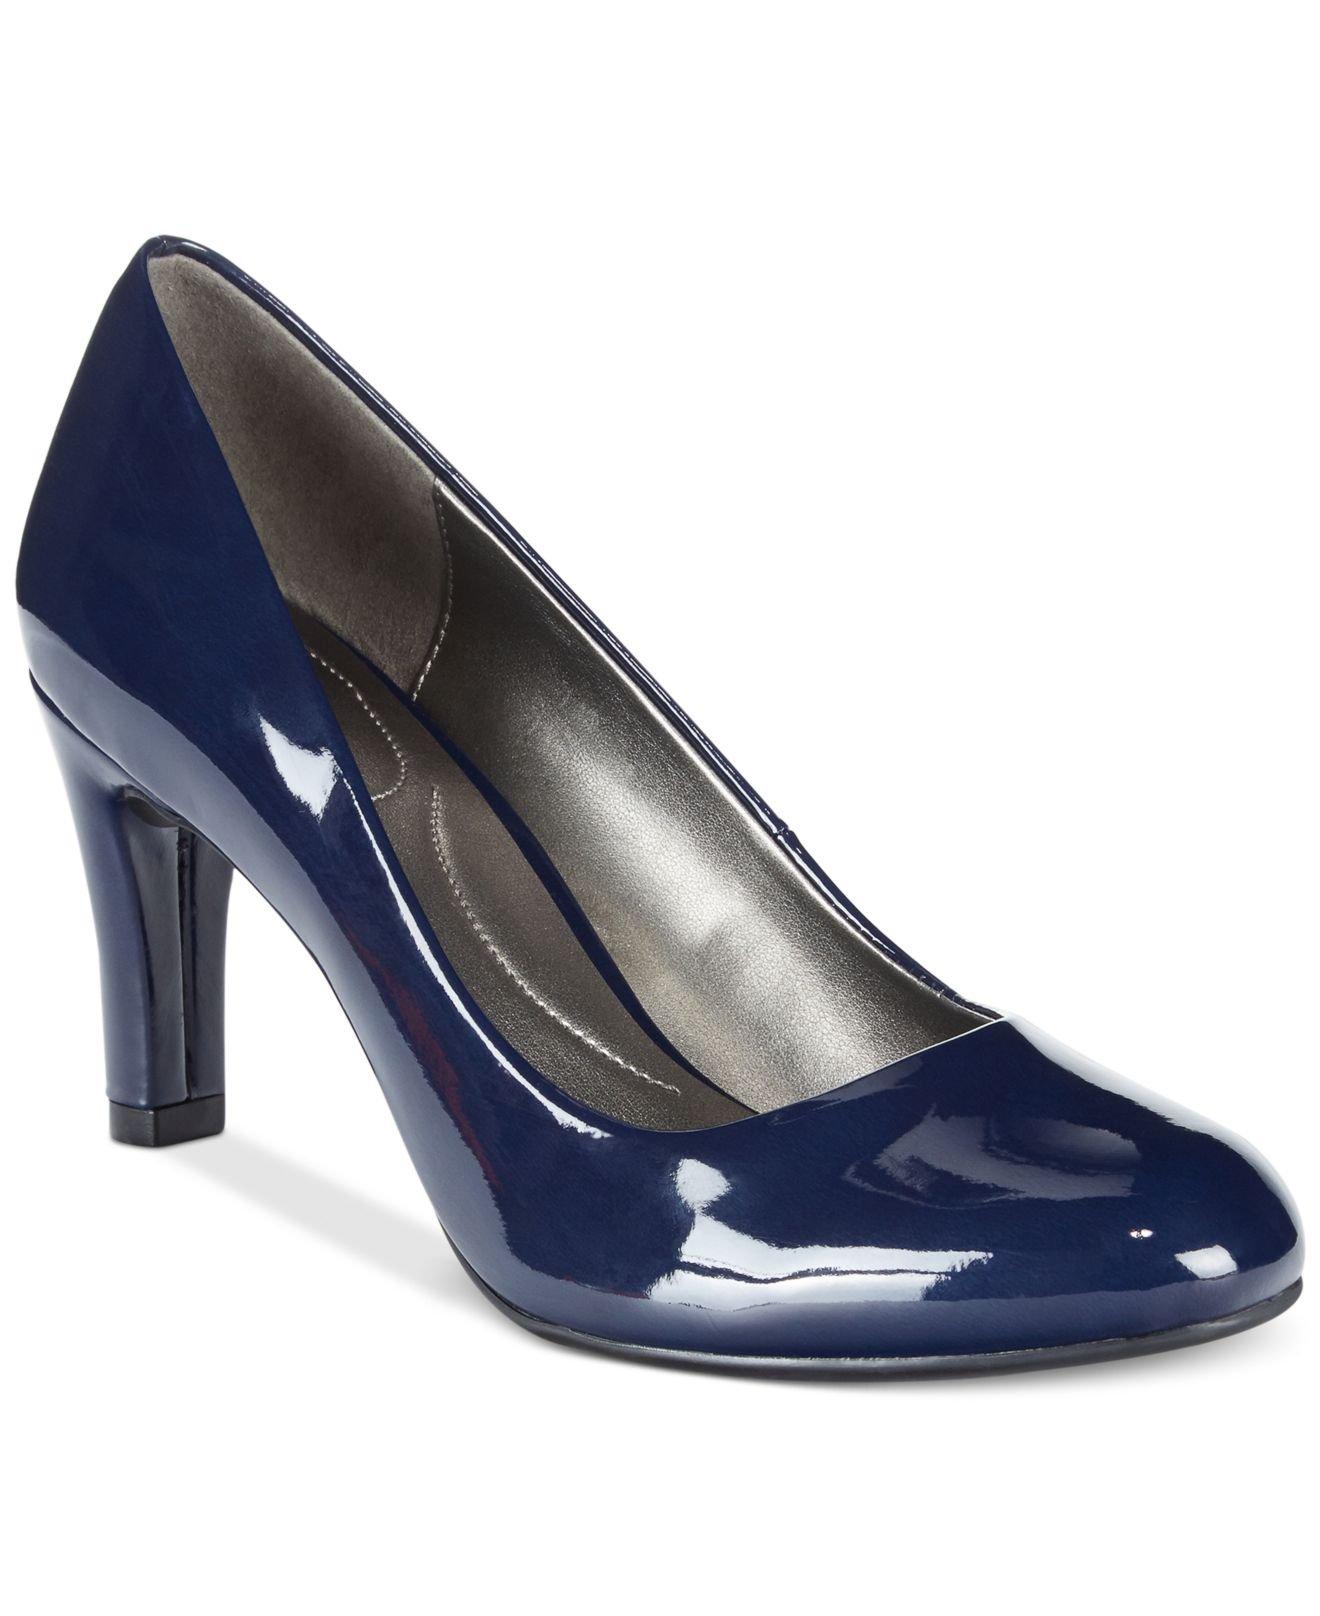 5b617464741 Lyst - Bandolino Lantana Pumps in Blue